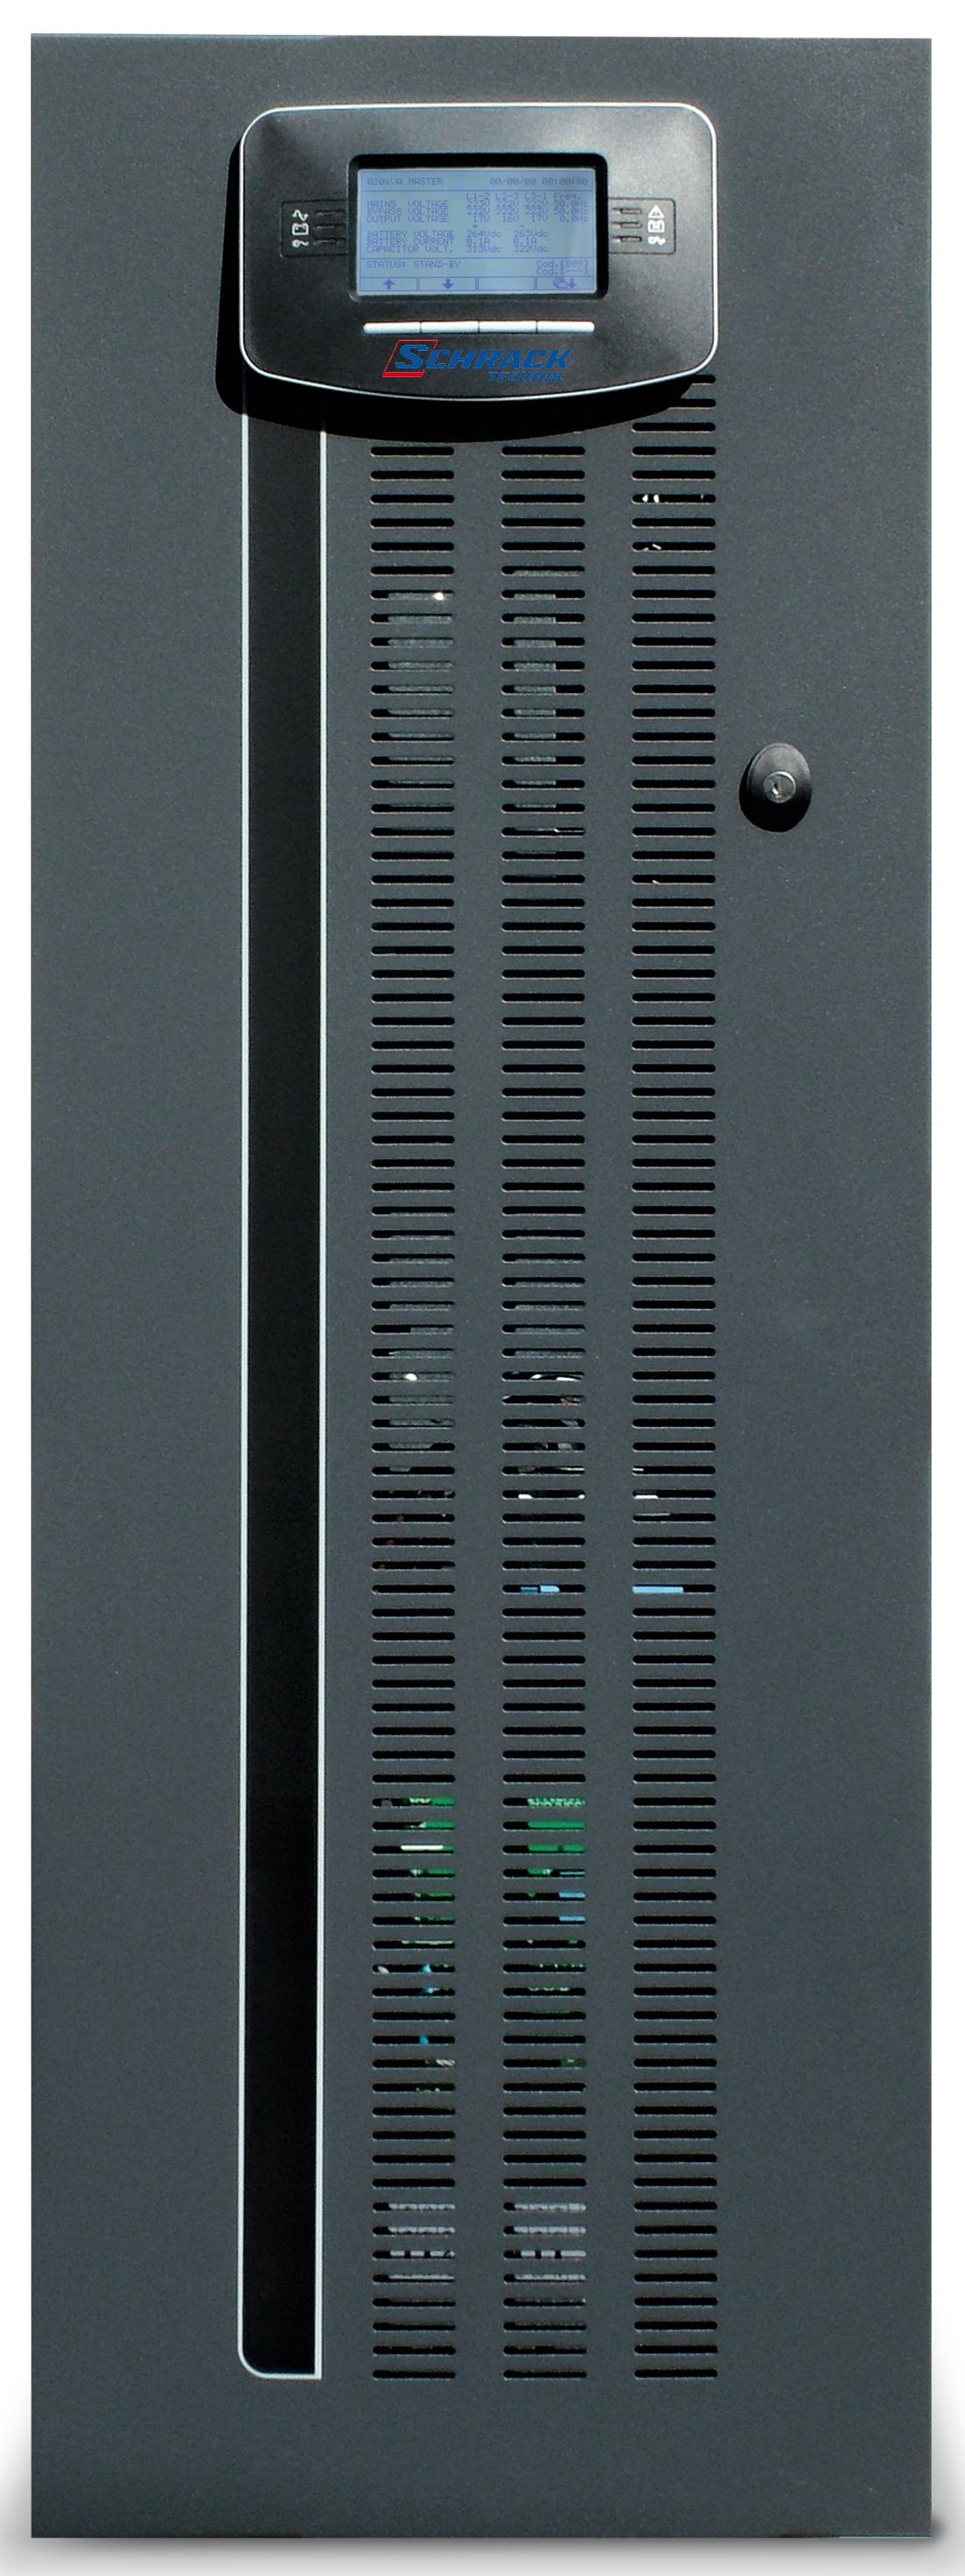 1 Stk USV AVARA Multi 10kVA 9kW 0Min. 3ph/1ph /Online USMLM10XA0